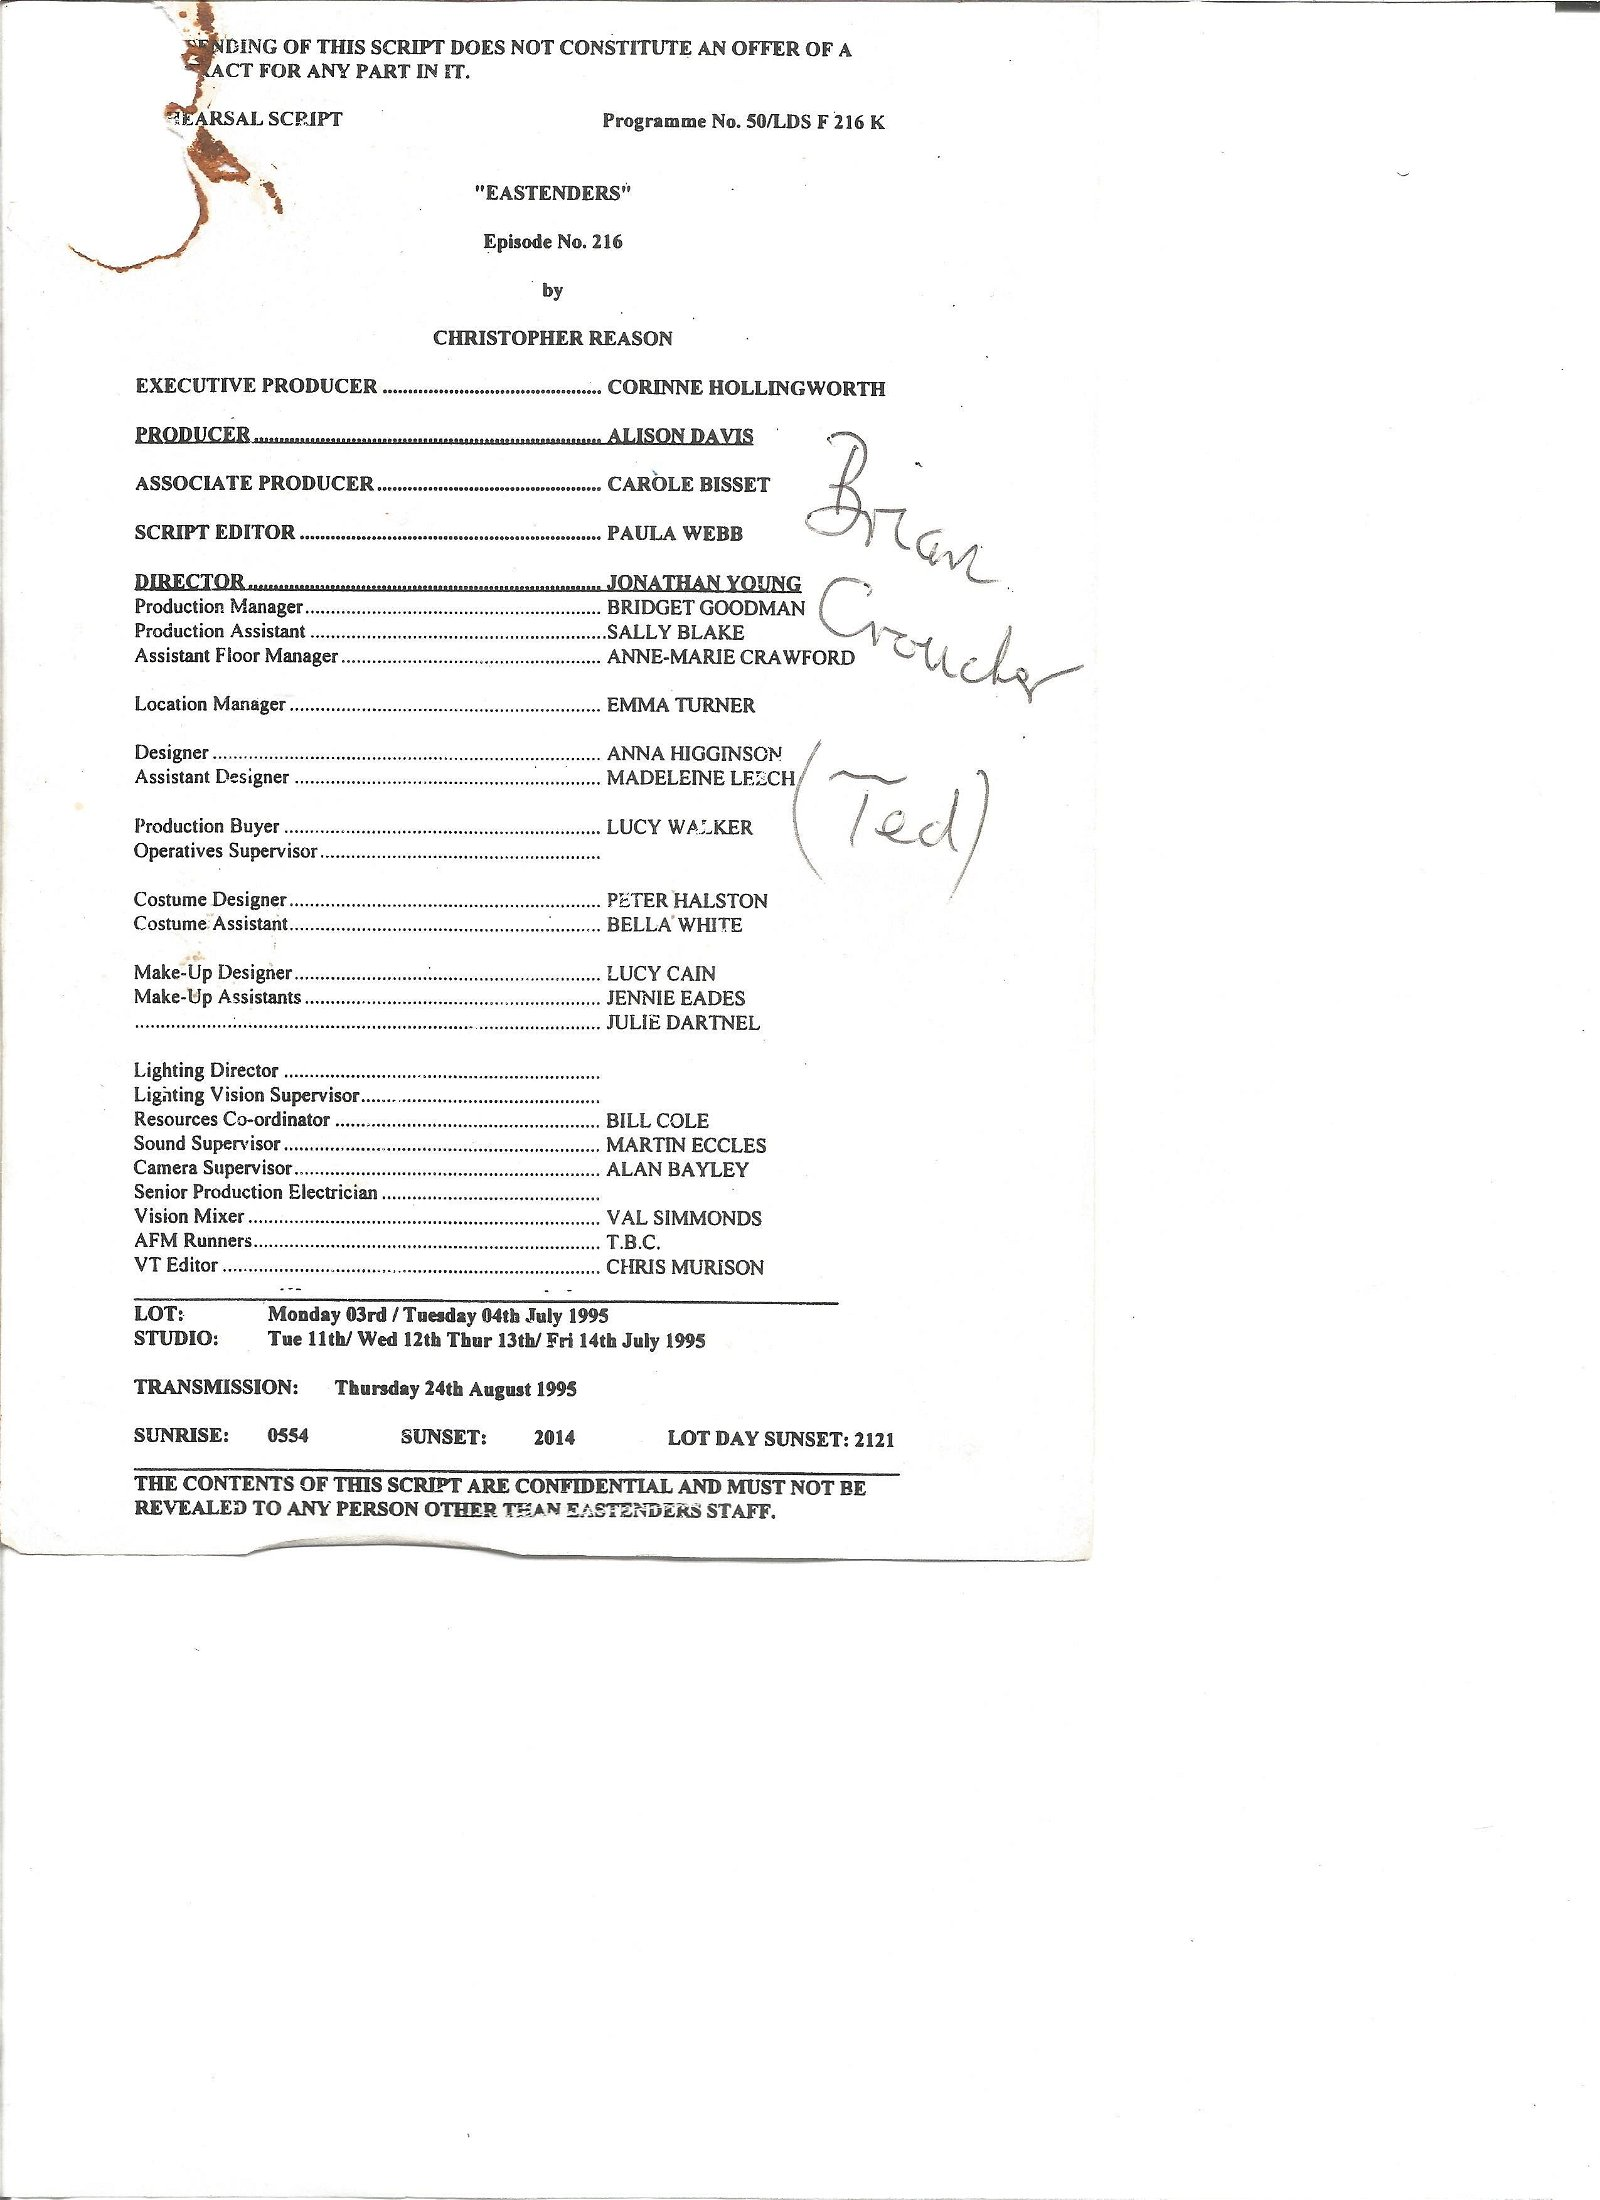 Brian Croucher signed Eastenders script. Good